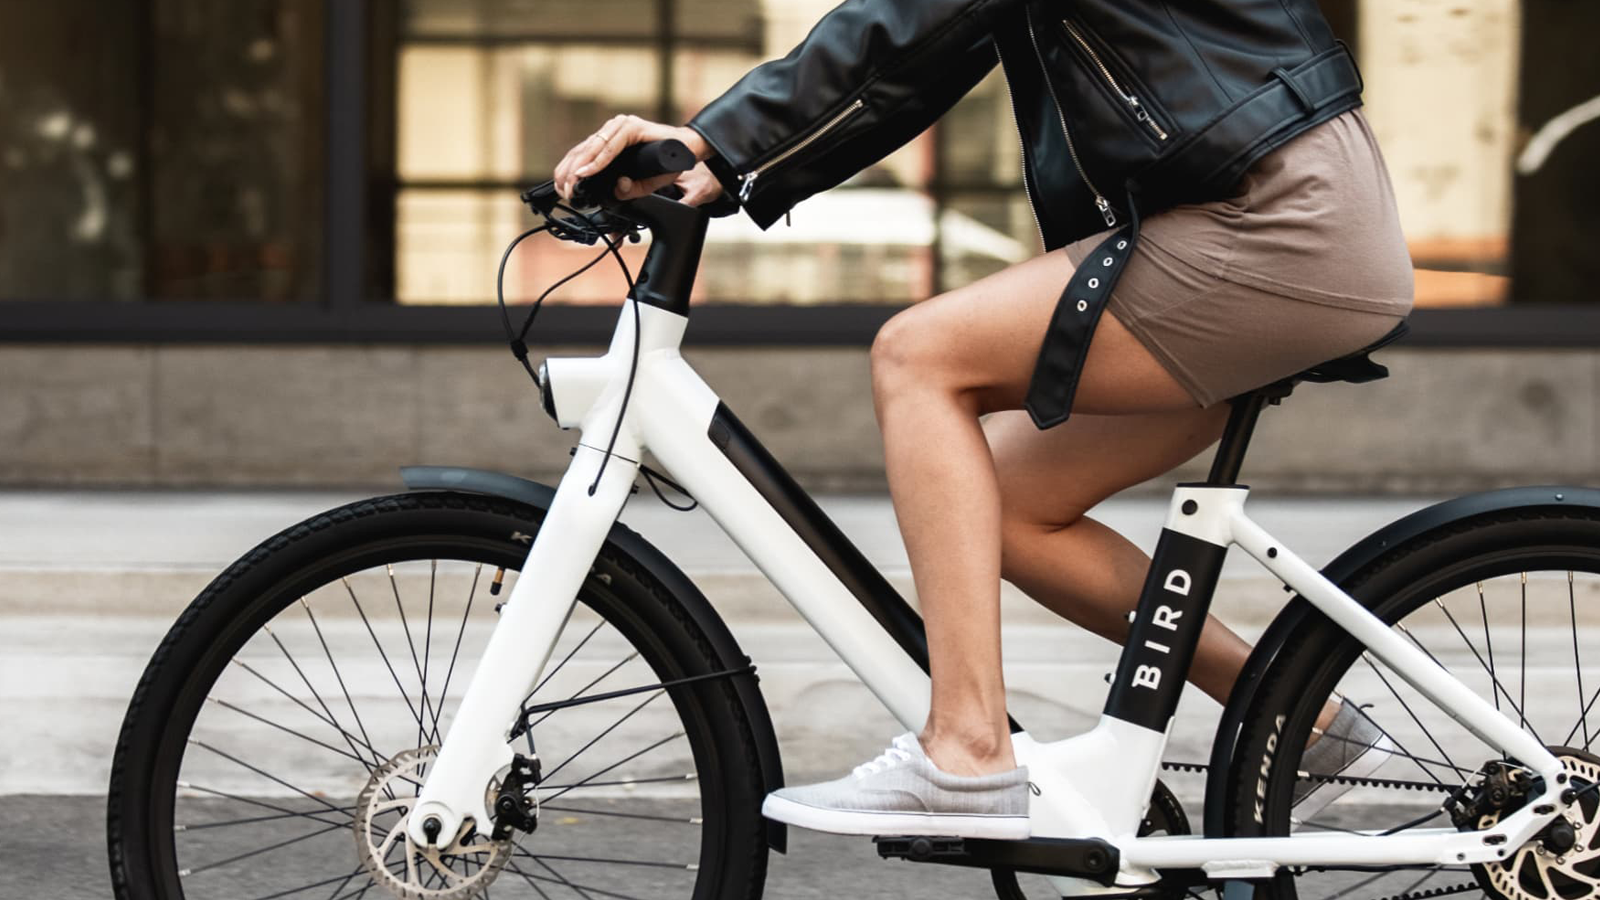 Person riding the Bird Bike on a modern urban street